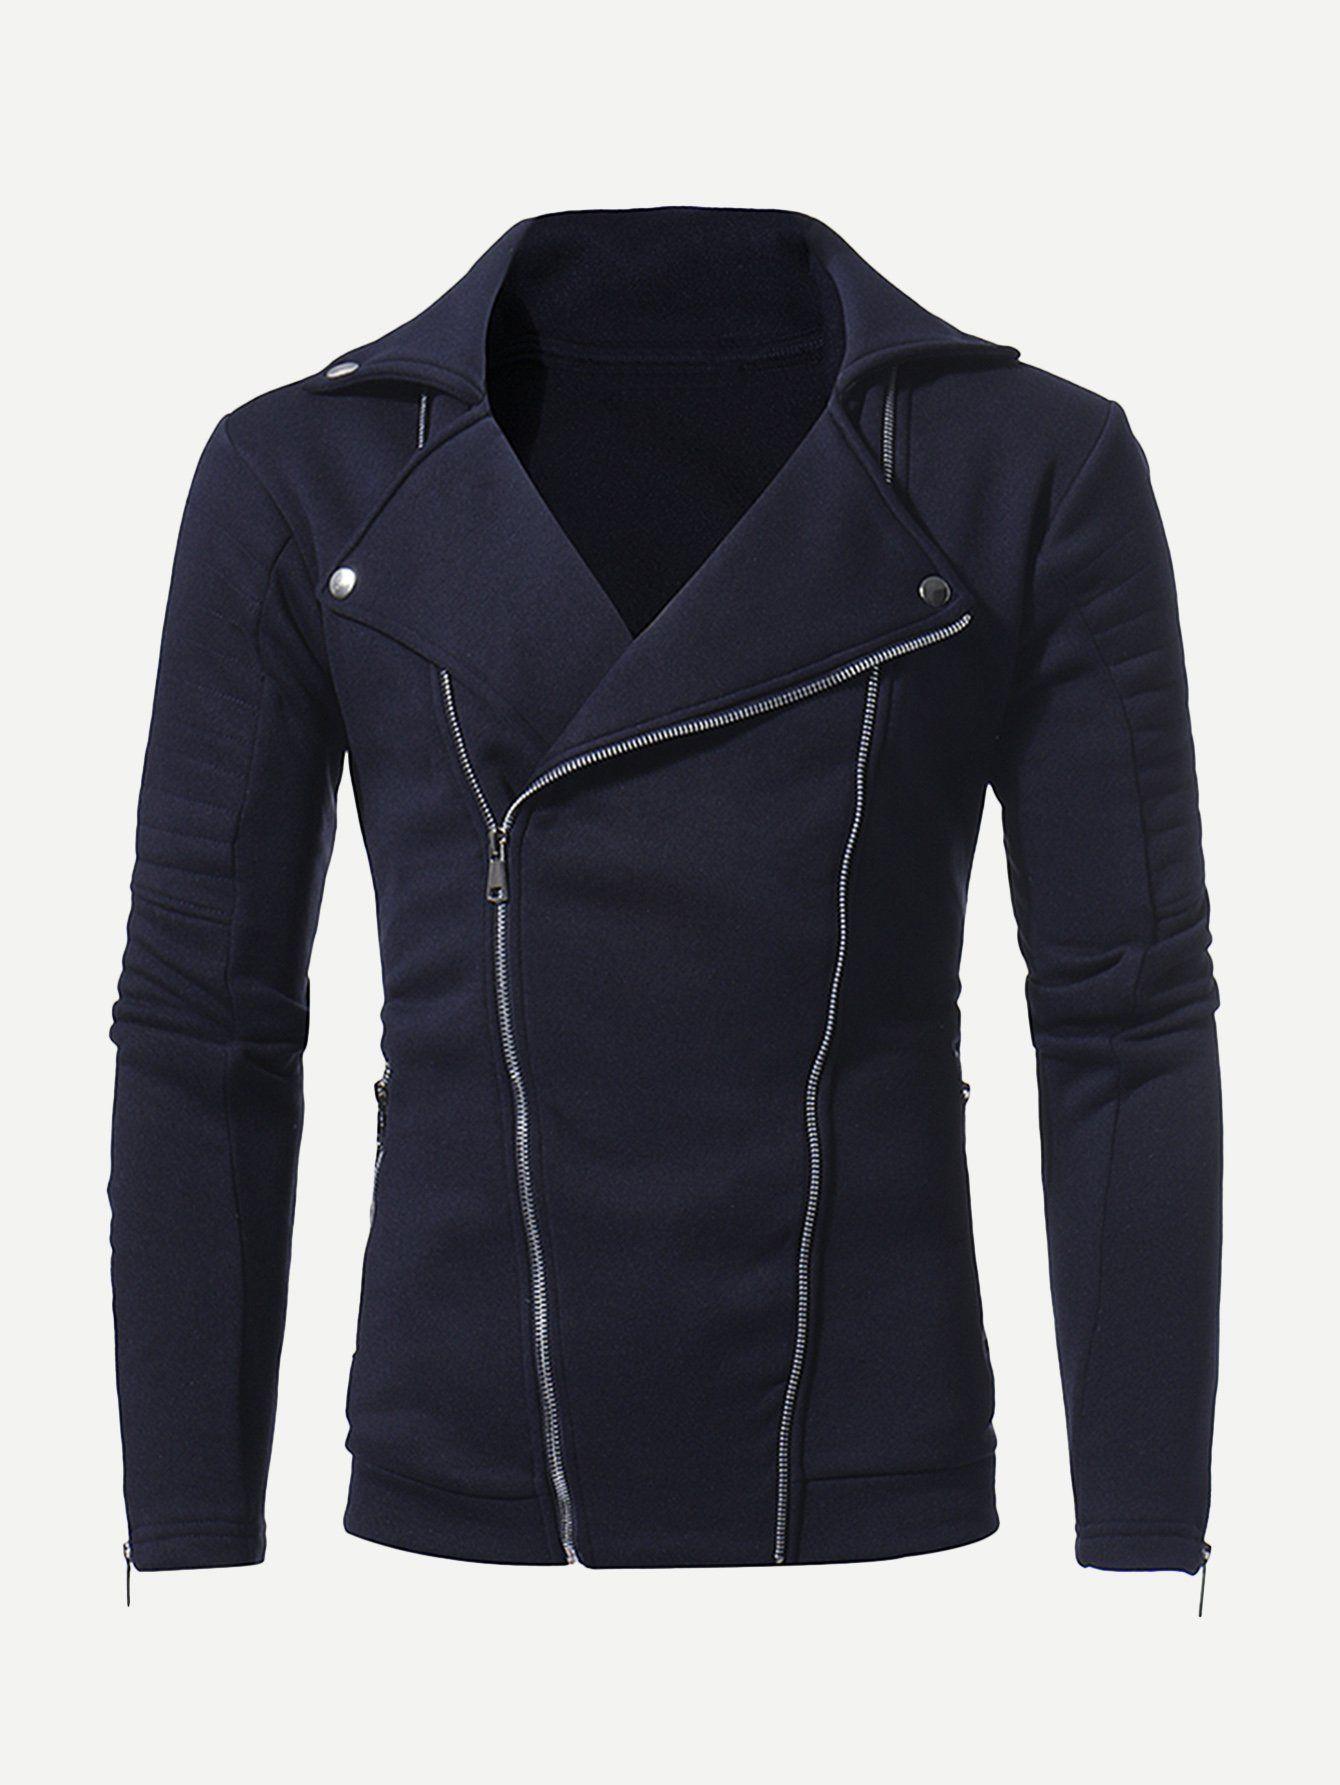 37dee1b8787d Asymmetric Zip Lapel Rocker Jacket | Products | Jackets, Men's coats ...